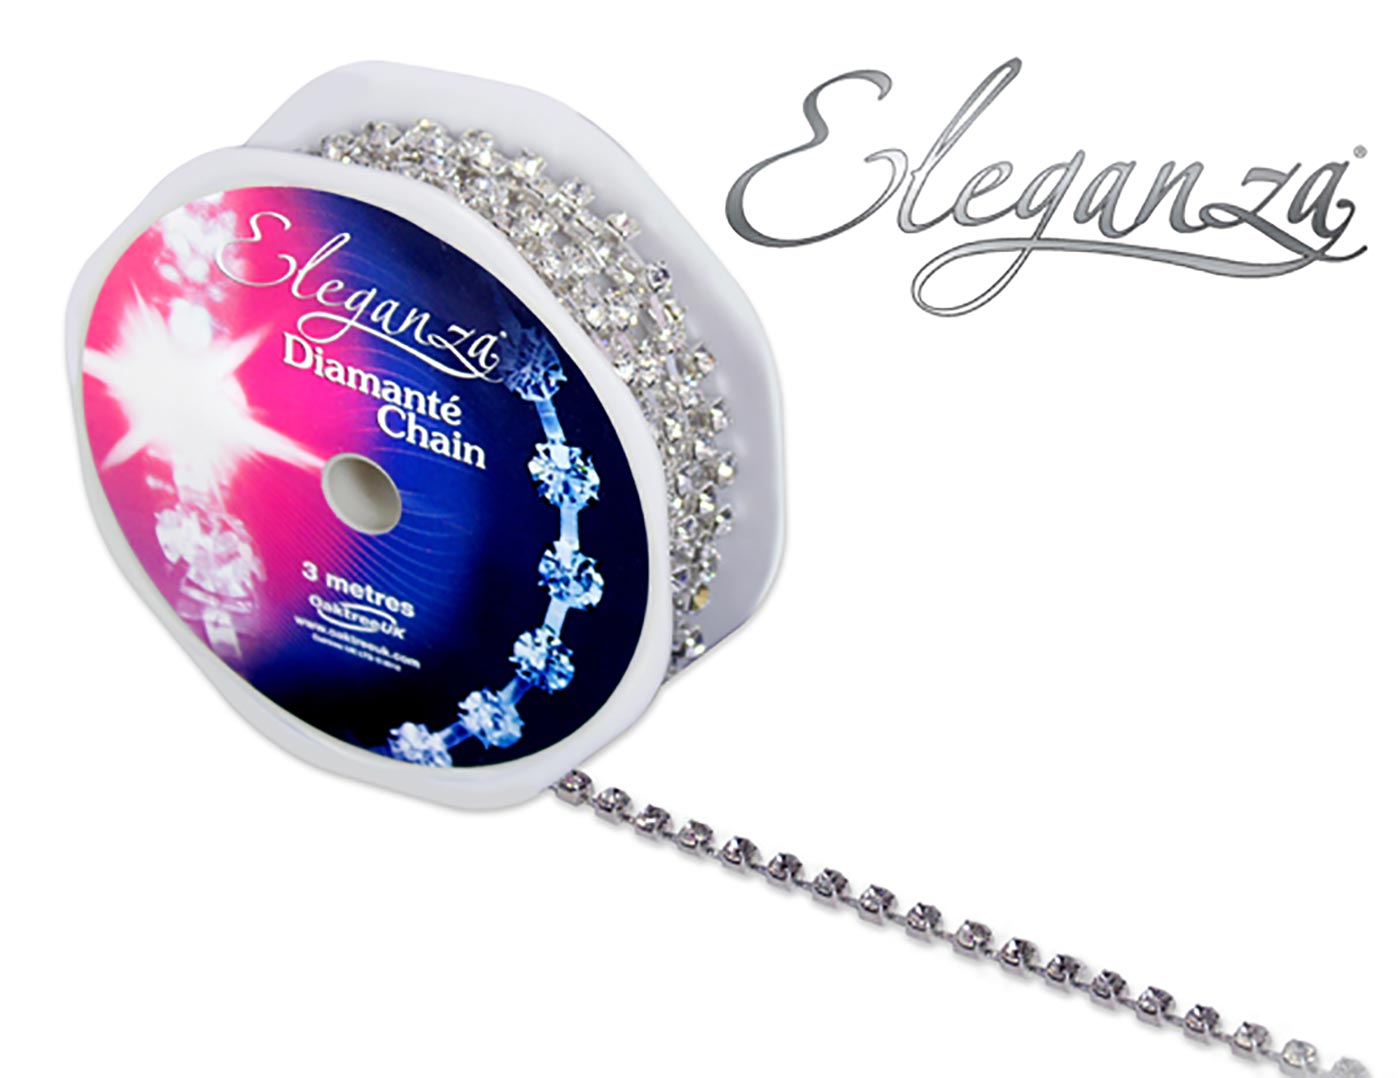 Eleganza Diamante Chain Large 4mm x 3m Silver/Clear